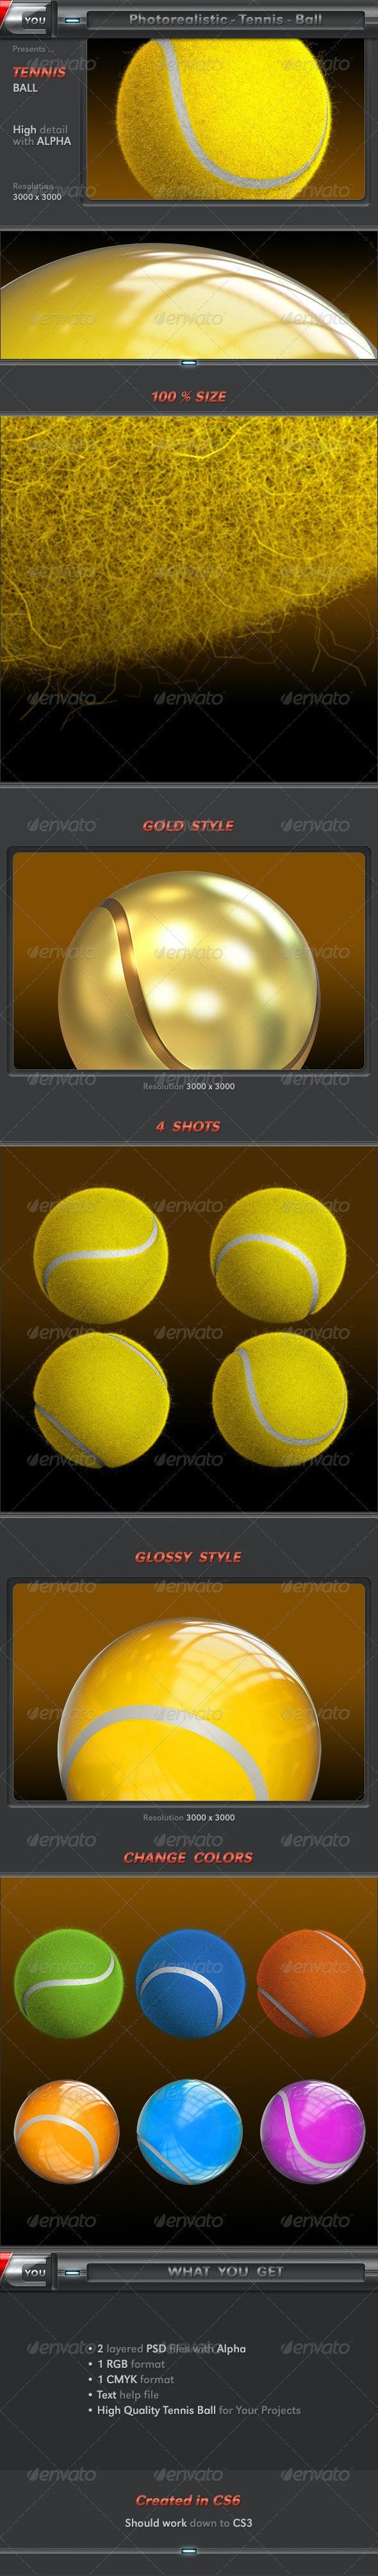 Tennis Ball - Objects 3D Renders